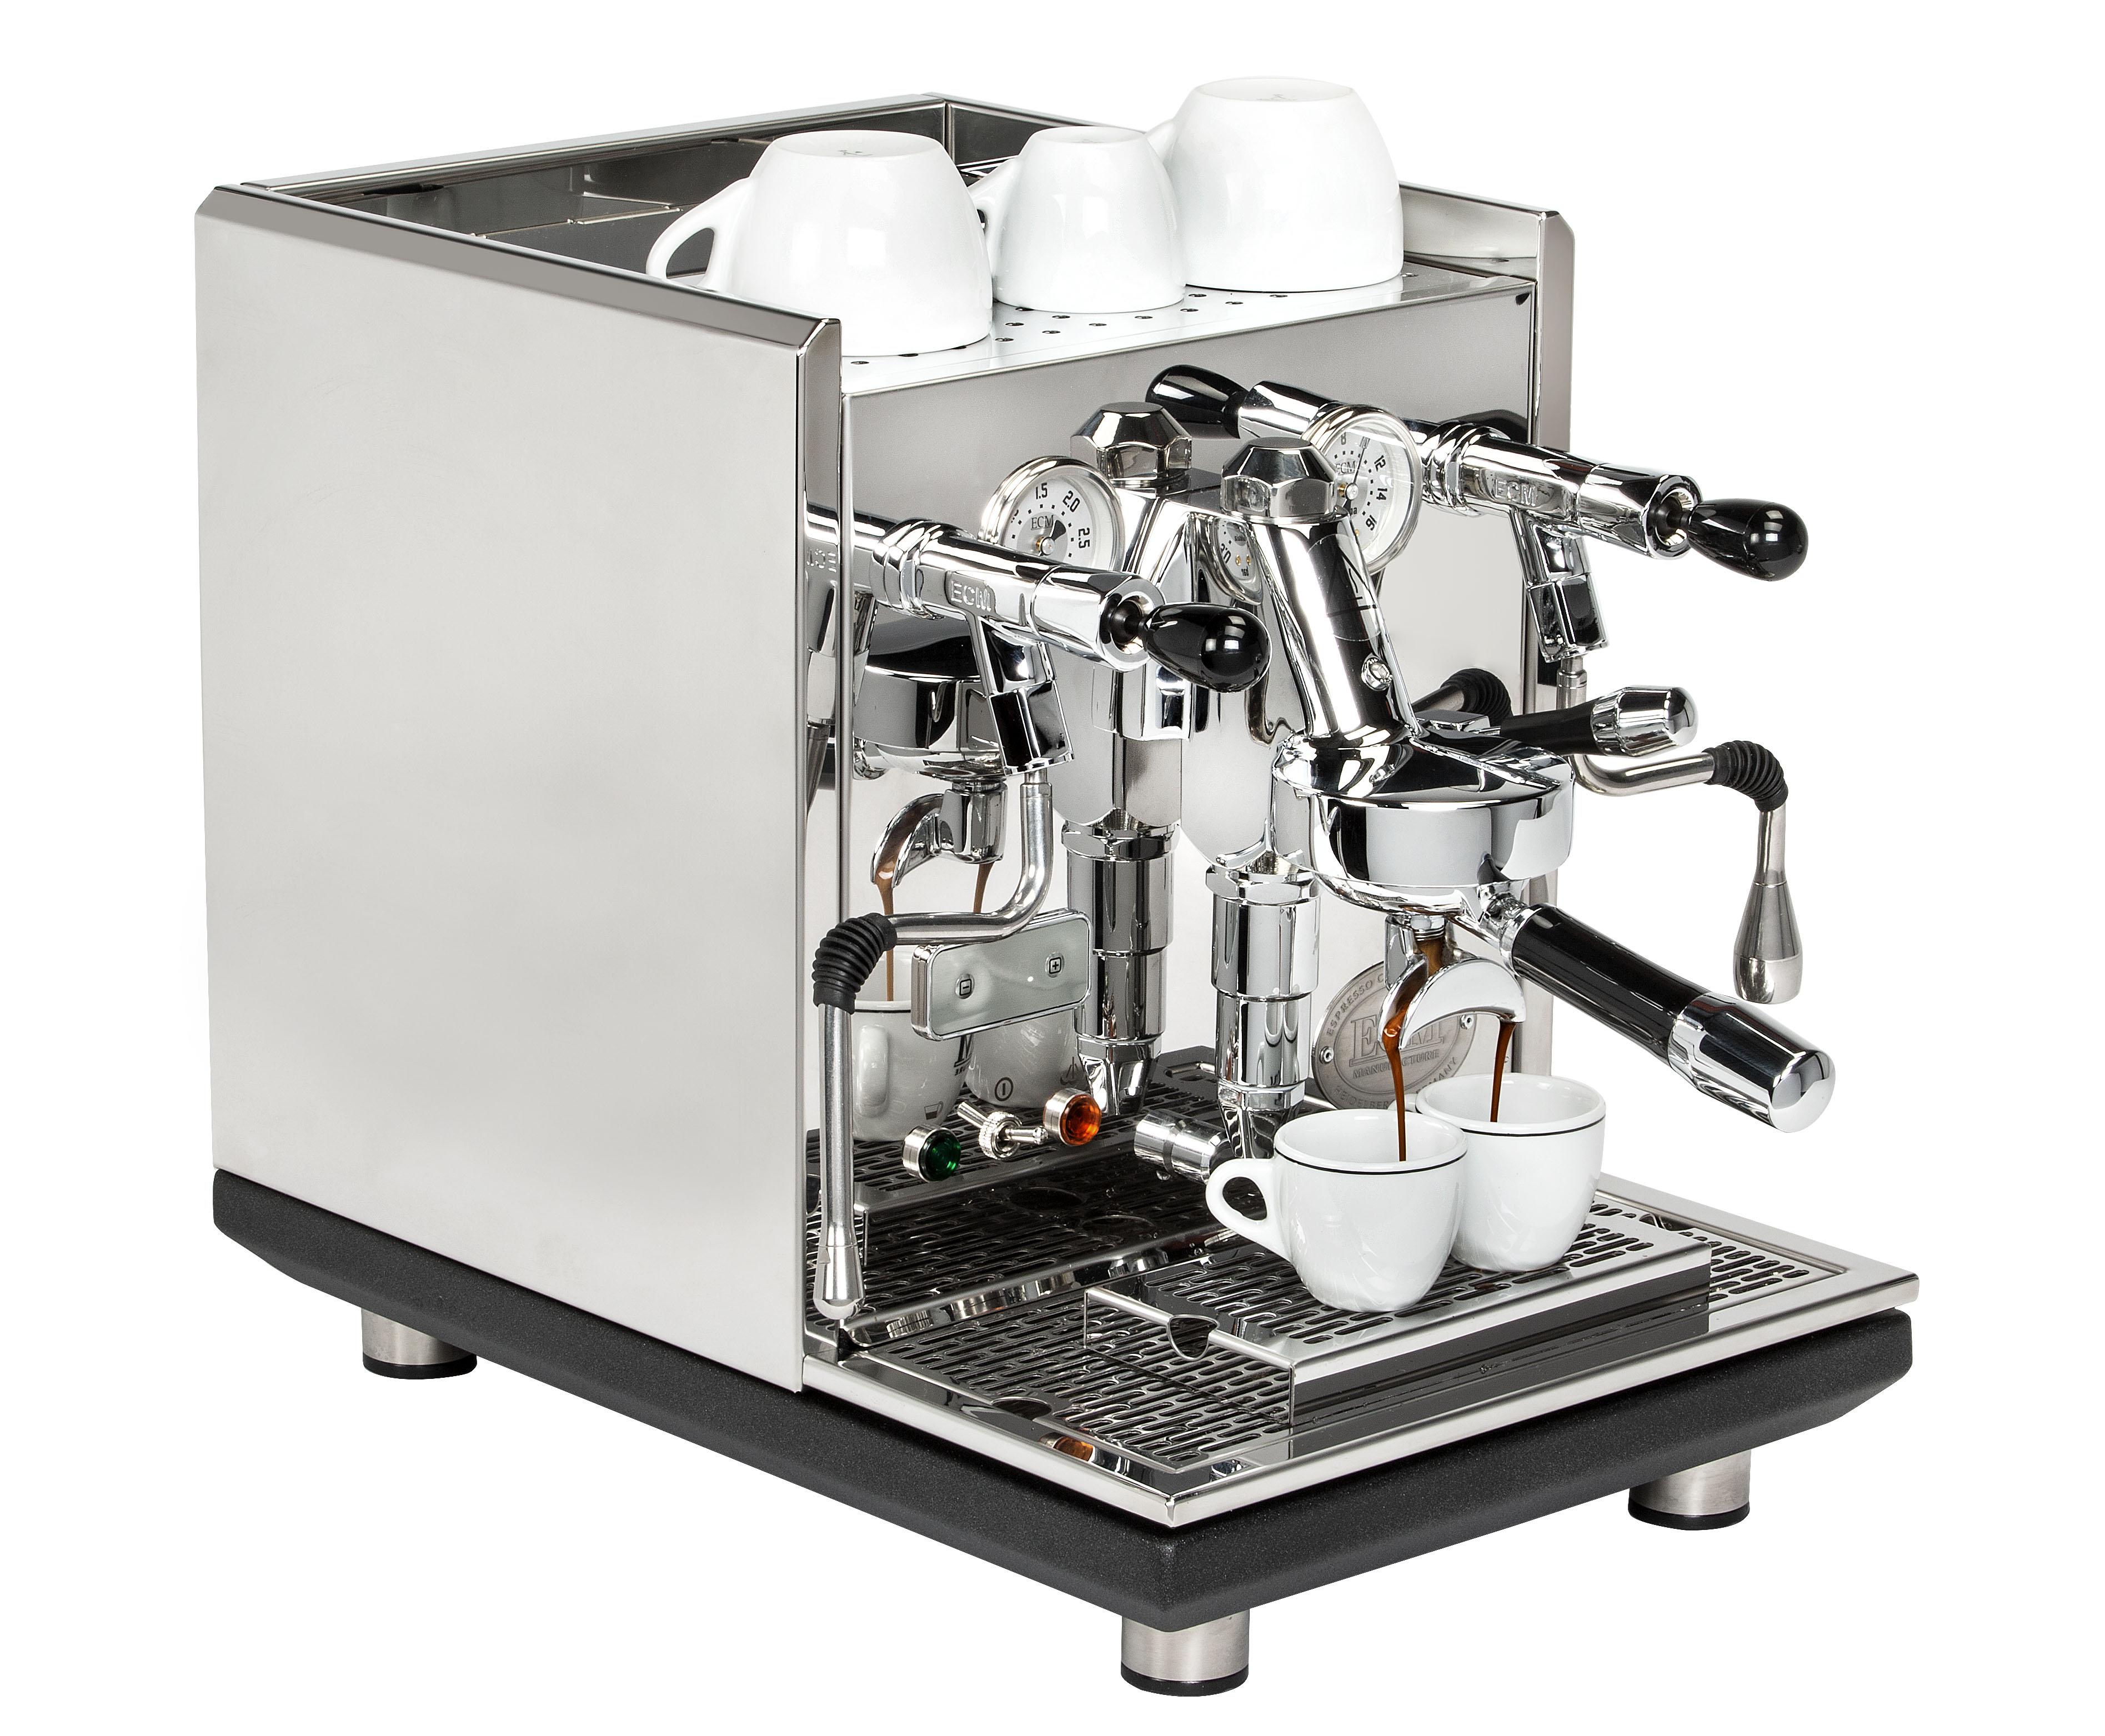 Espresso Auslauf.jpg synchronika